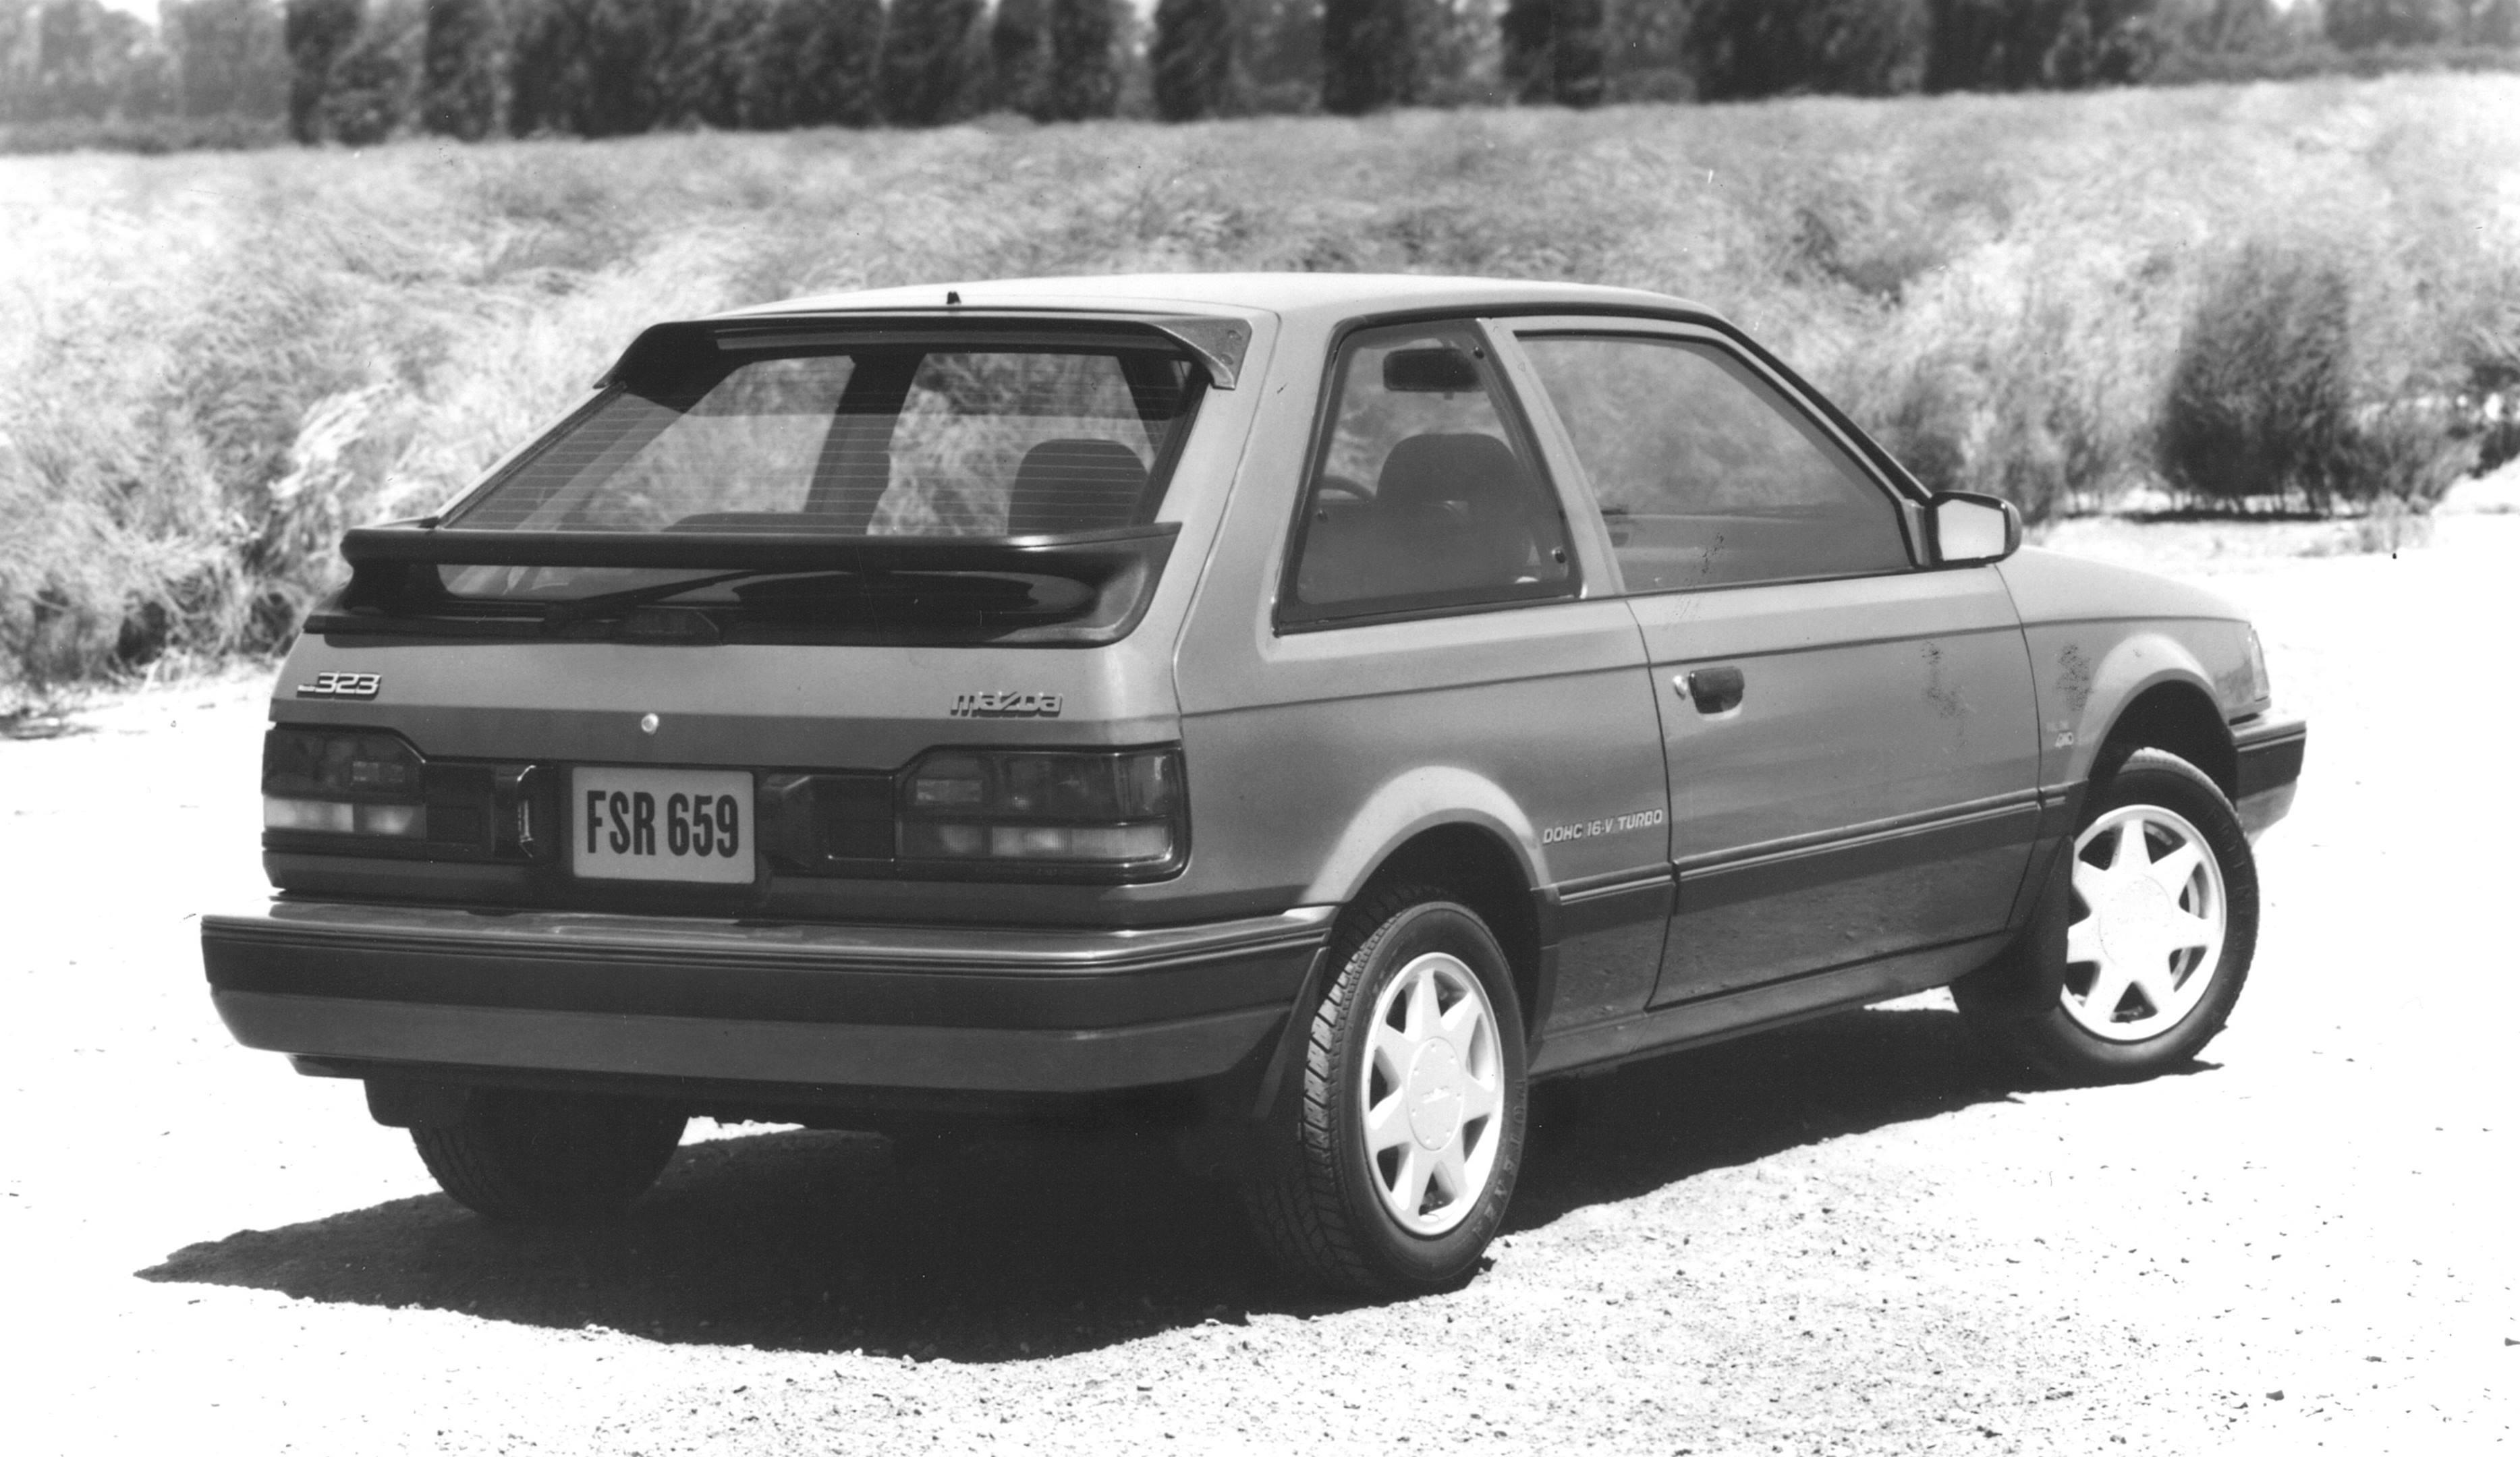 1988 Mazda 323 GTX rear 3/4